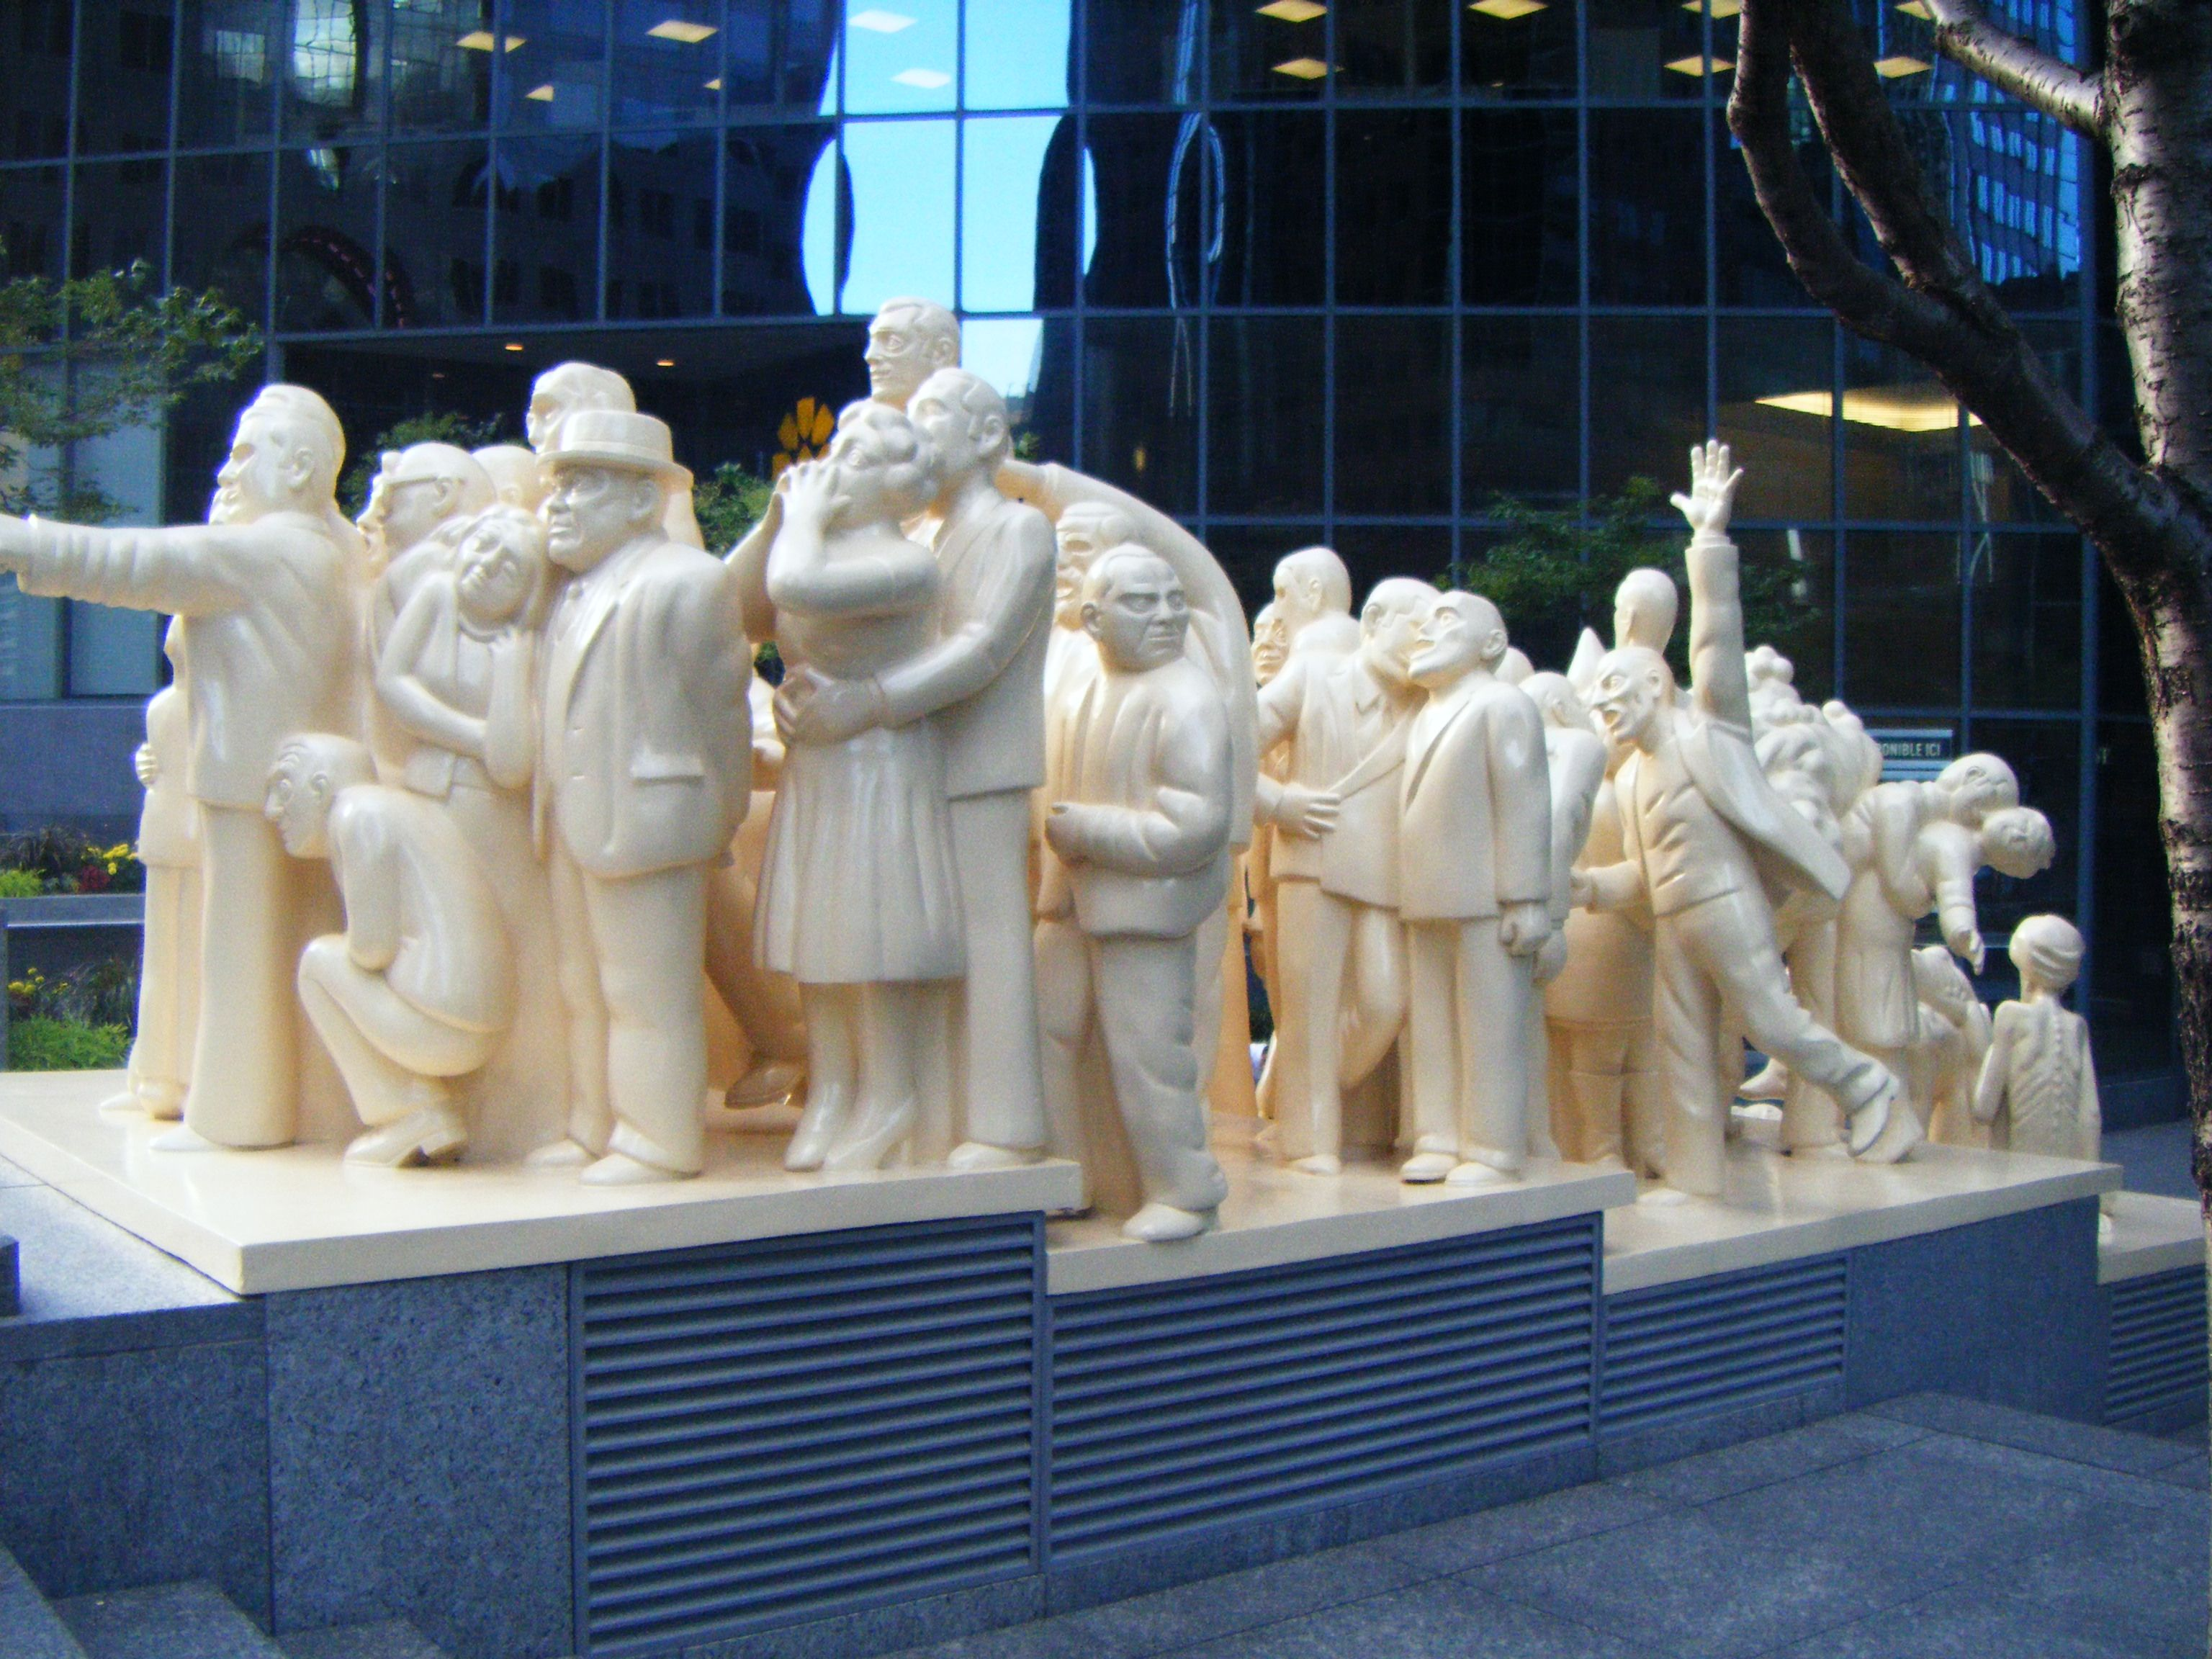 La Foule Illuminee statue in Montreal.